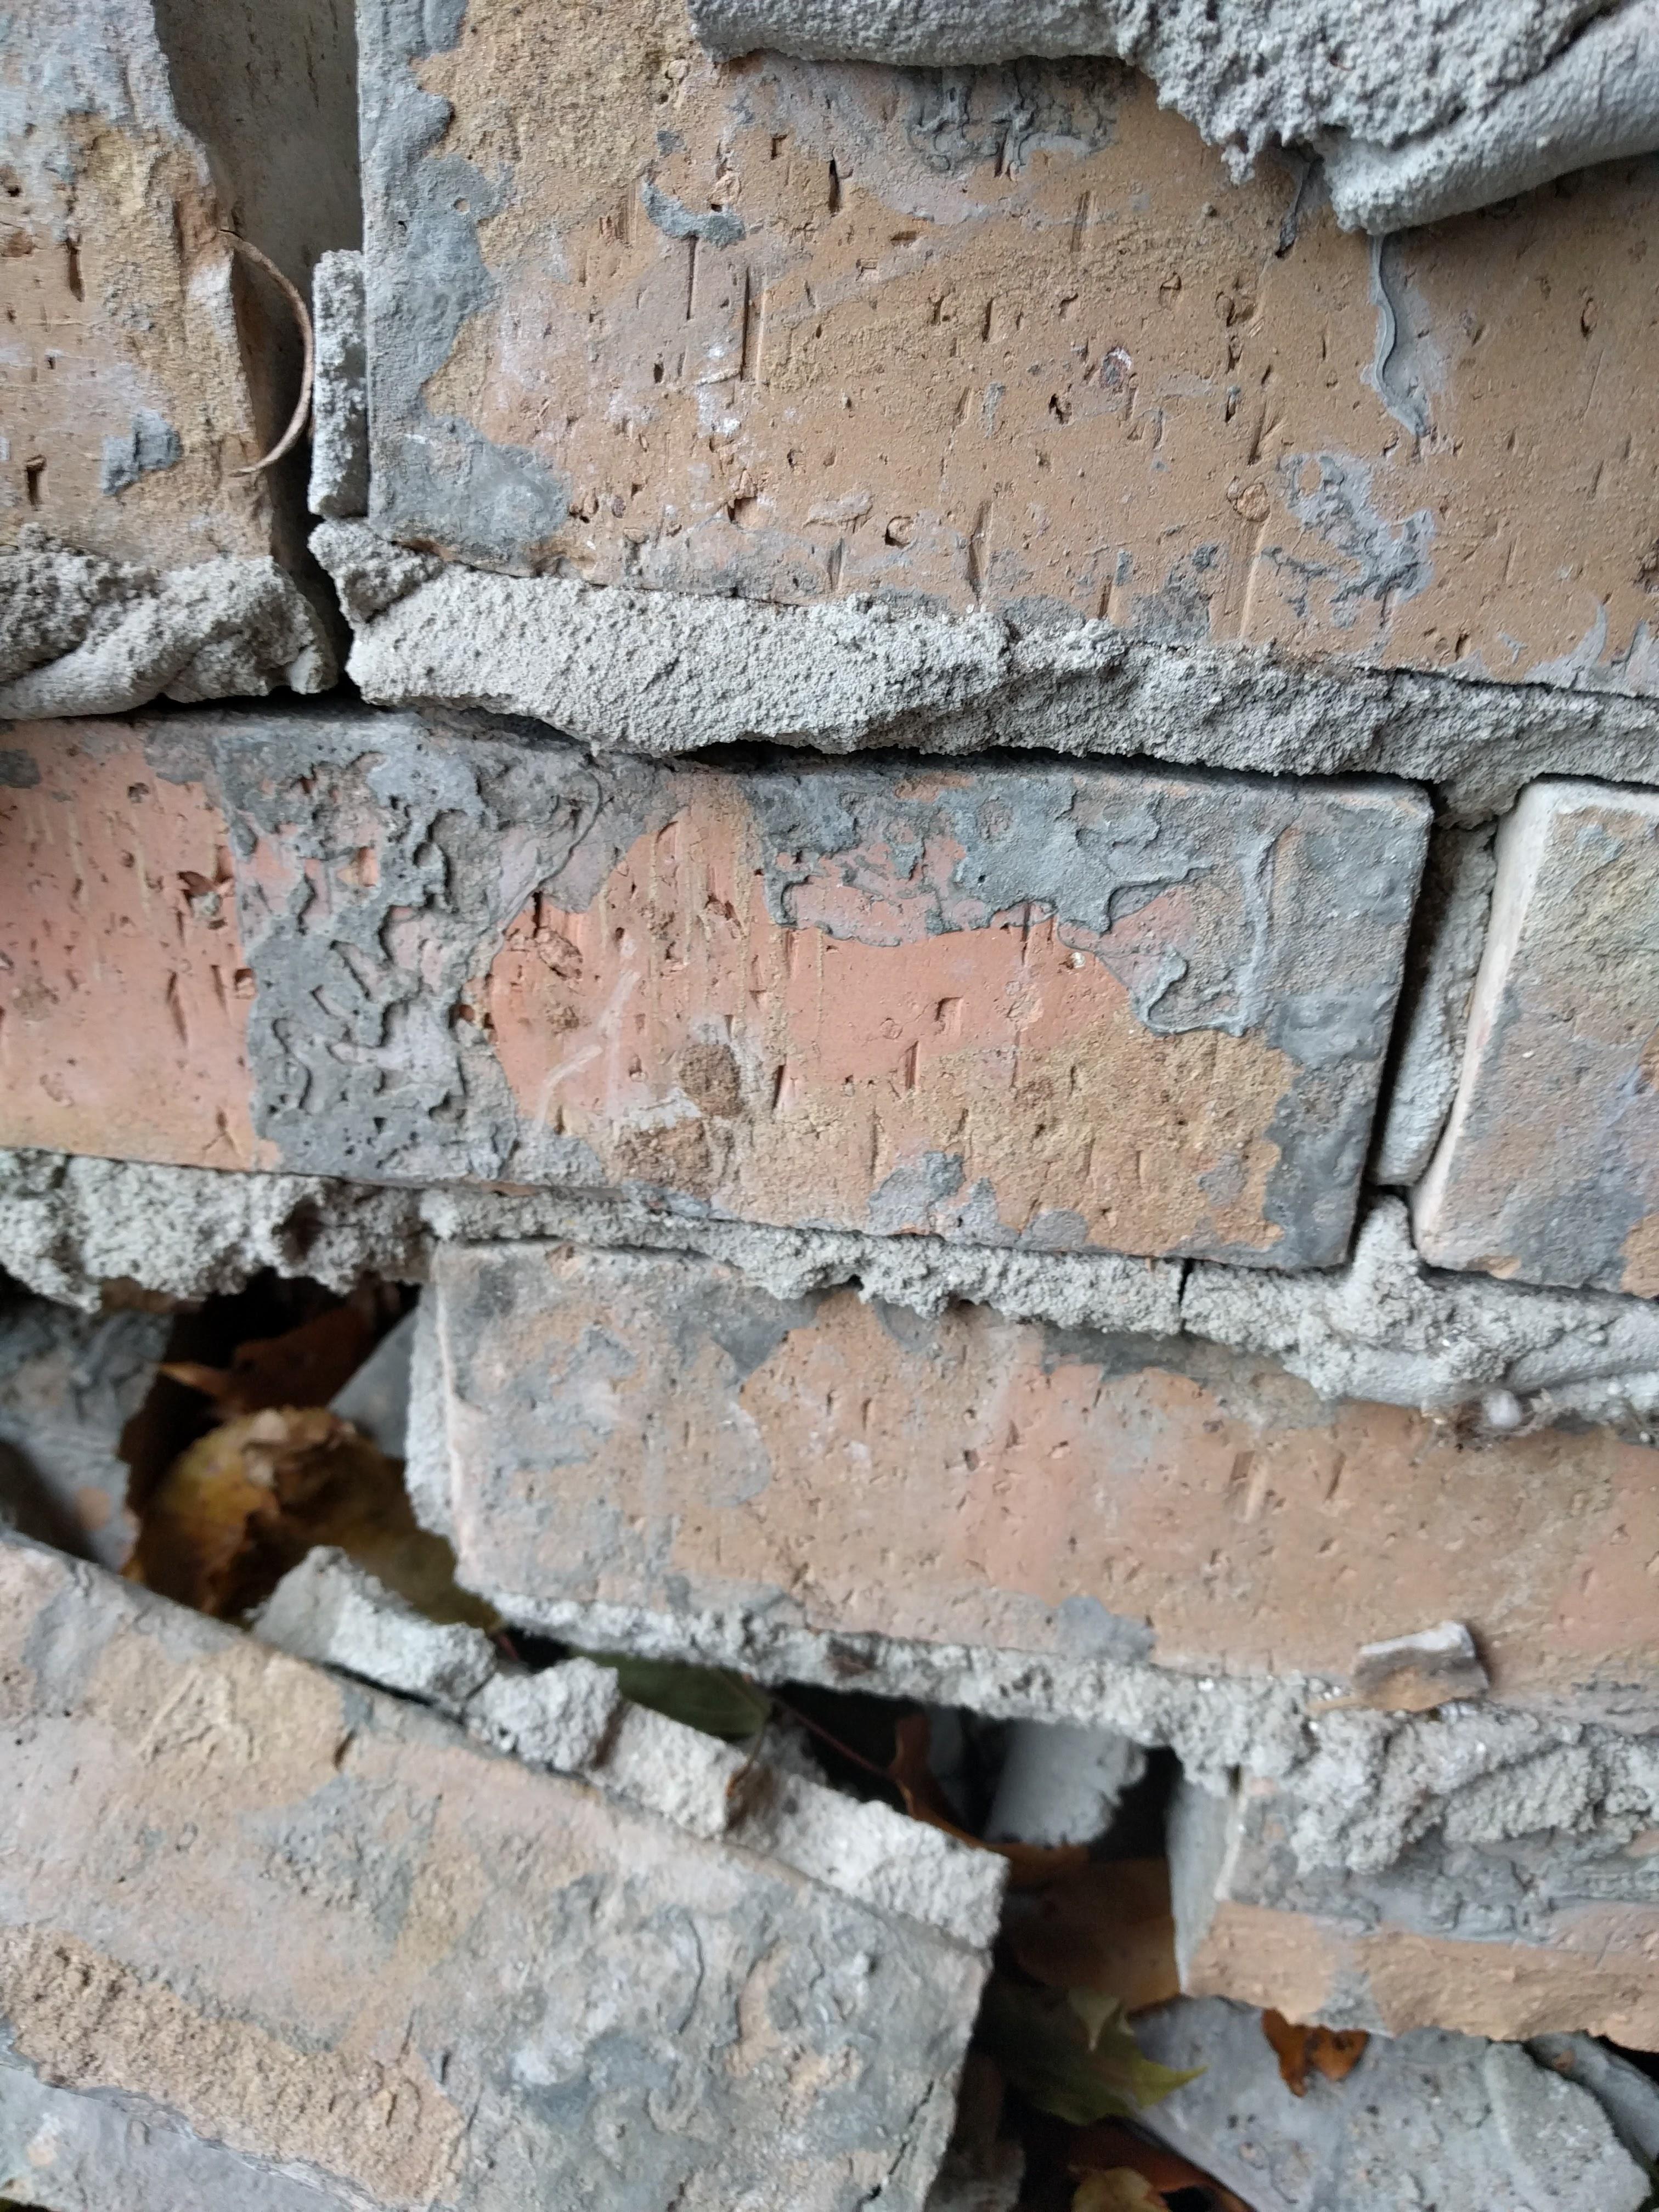 Replacement of Brick w/ a gray glaze/morter spread on face of it-brick-back-side-glaze.jpg